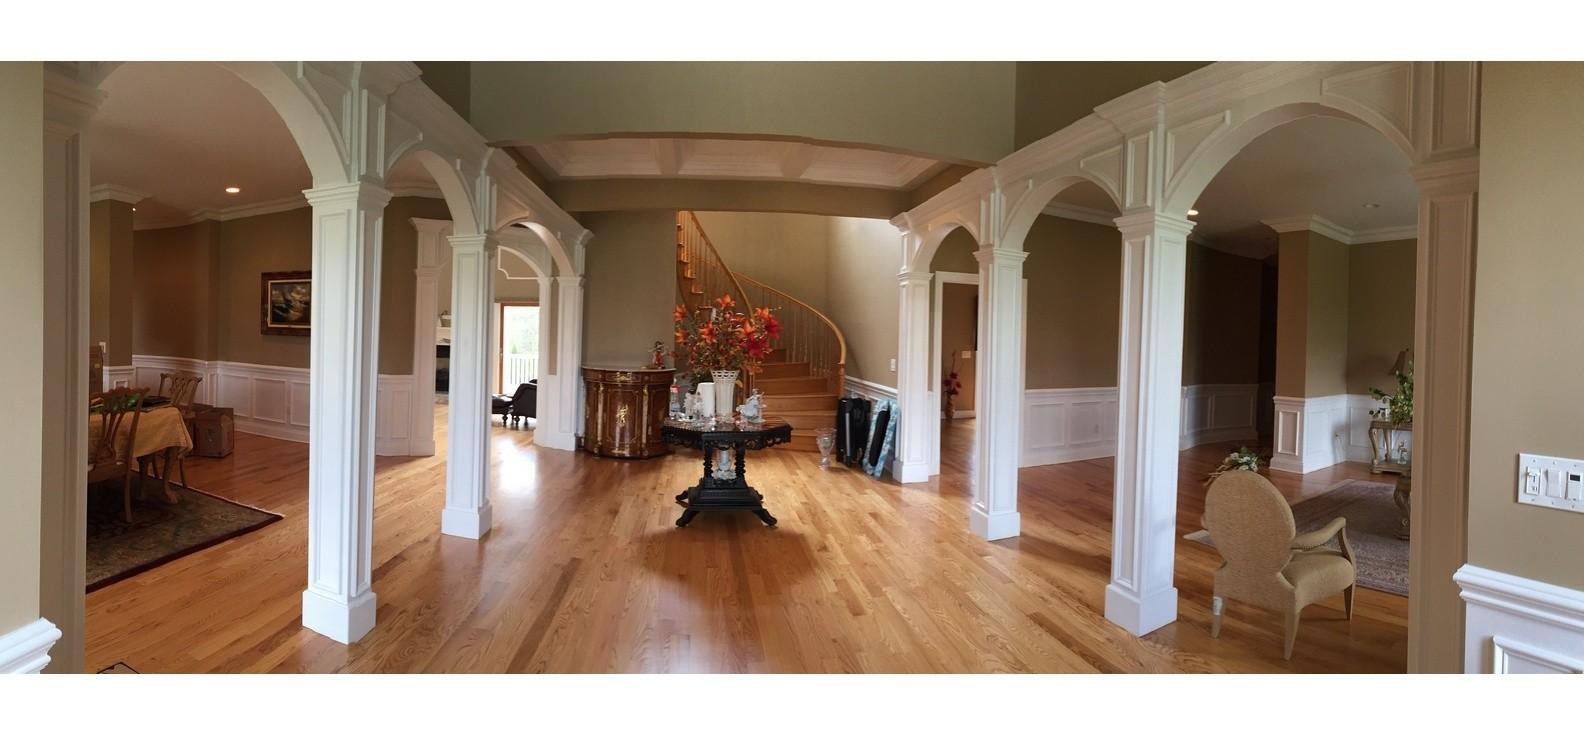 Arches  Custom Interior Arches  Crown Molding NJ LLC